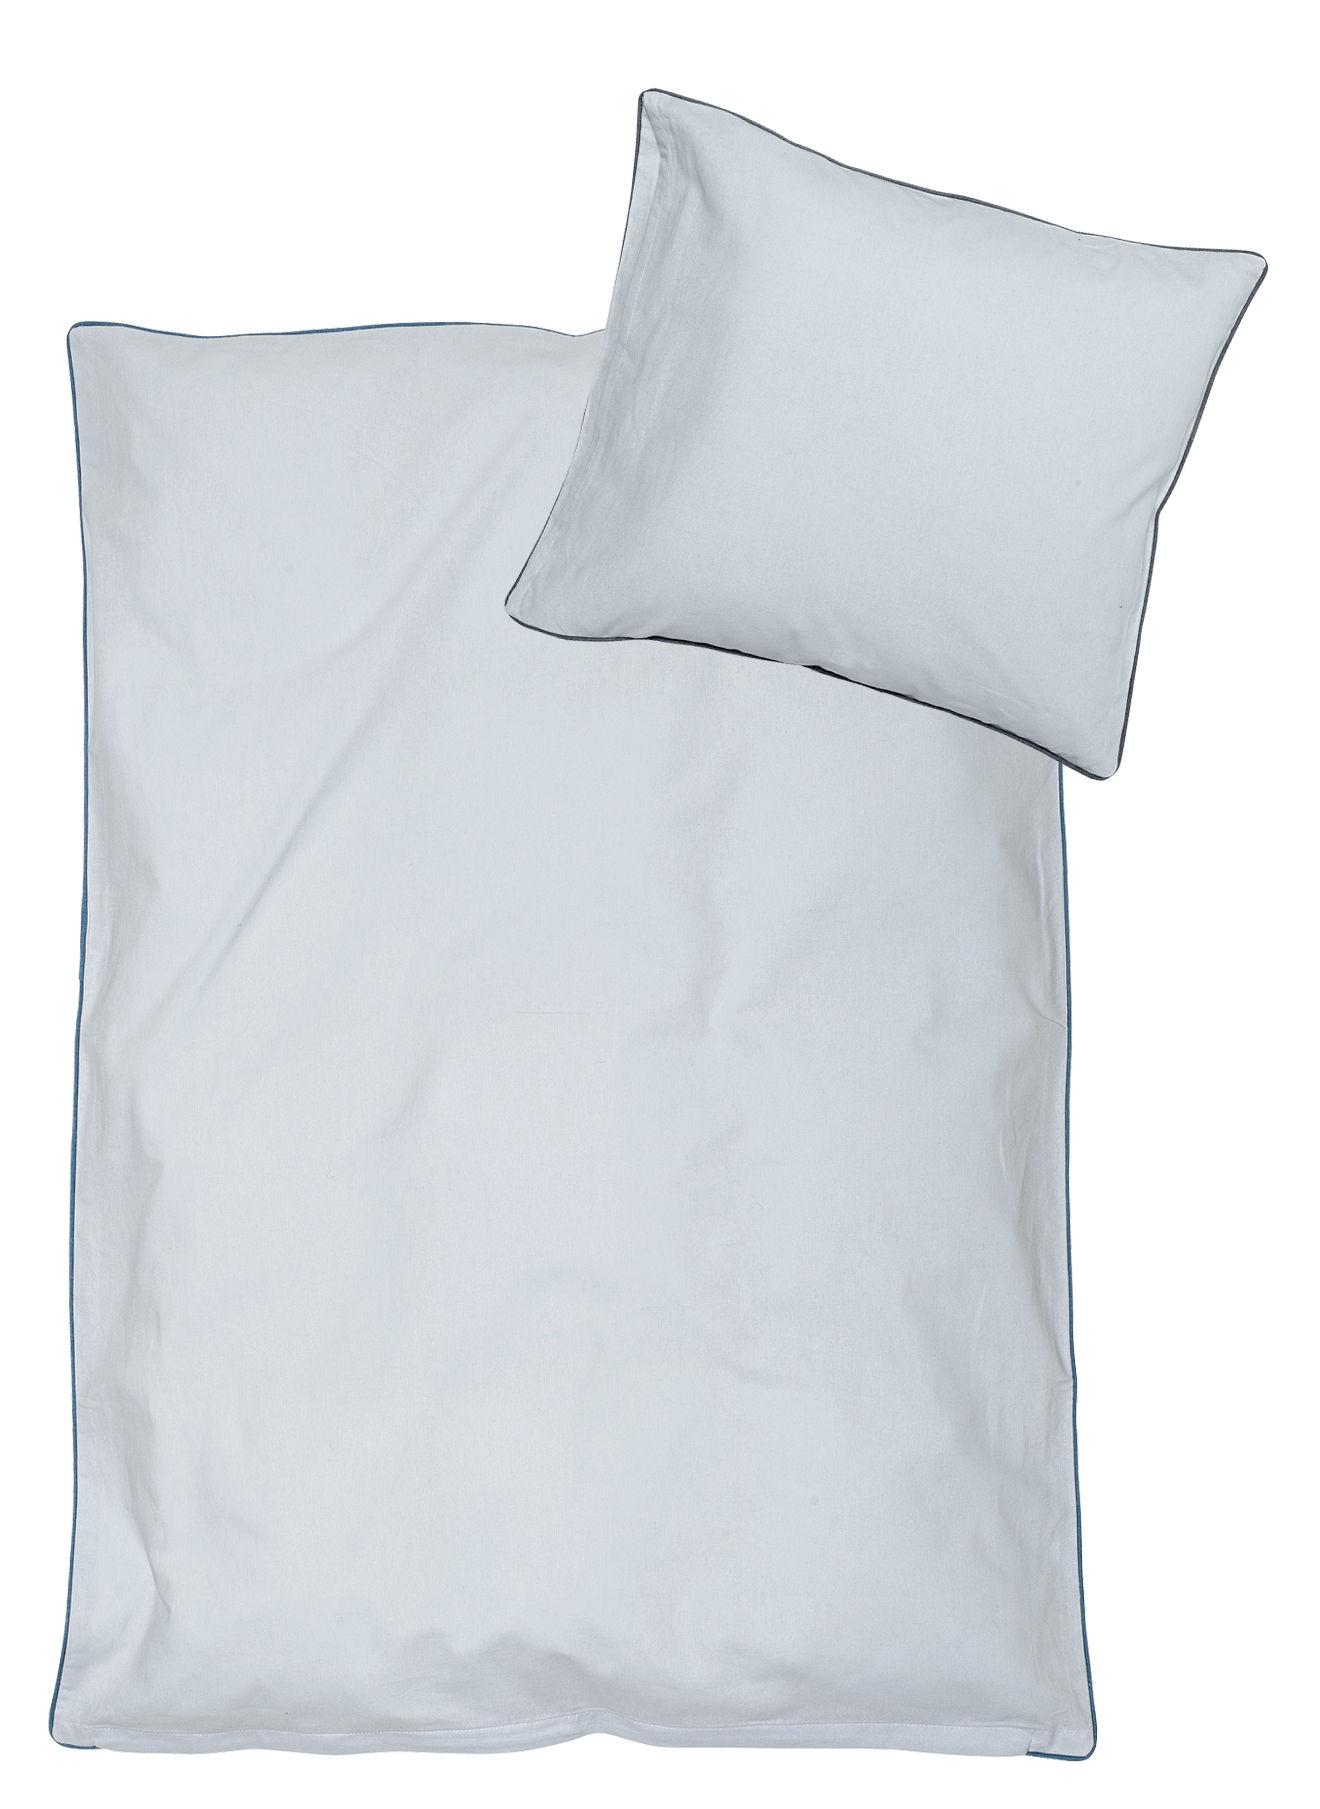 rasmus bettw sche f r kinderbett 100 x 140 cm 100 x. Black Bedroom Furniture Sets. Home Design Ideas